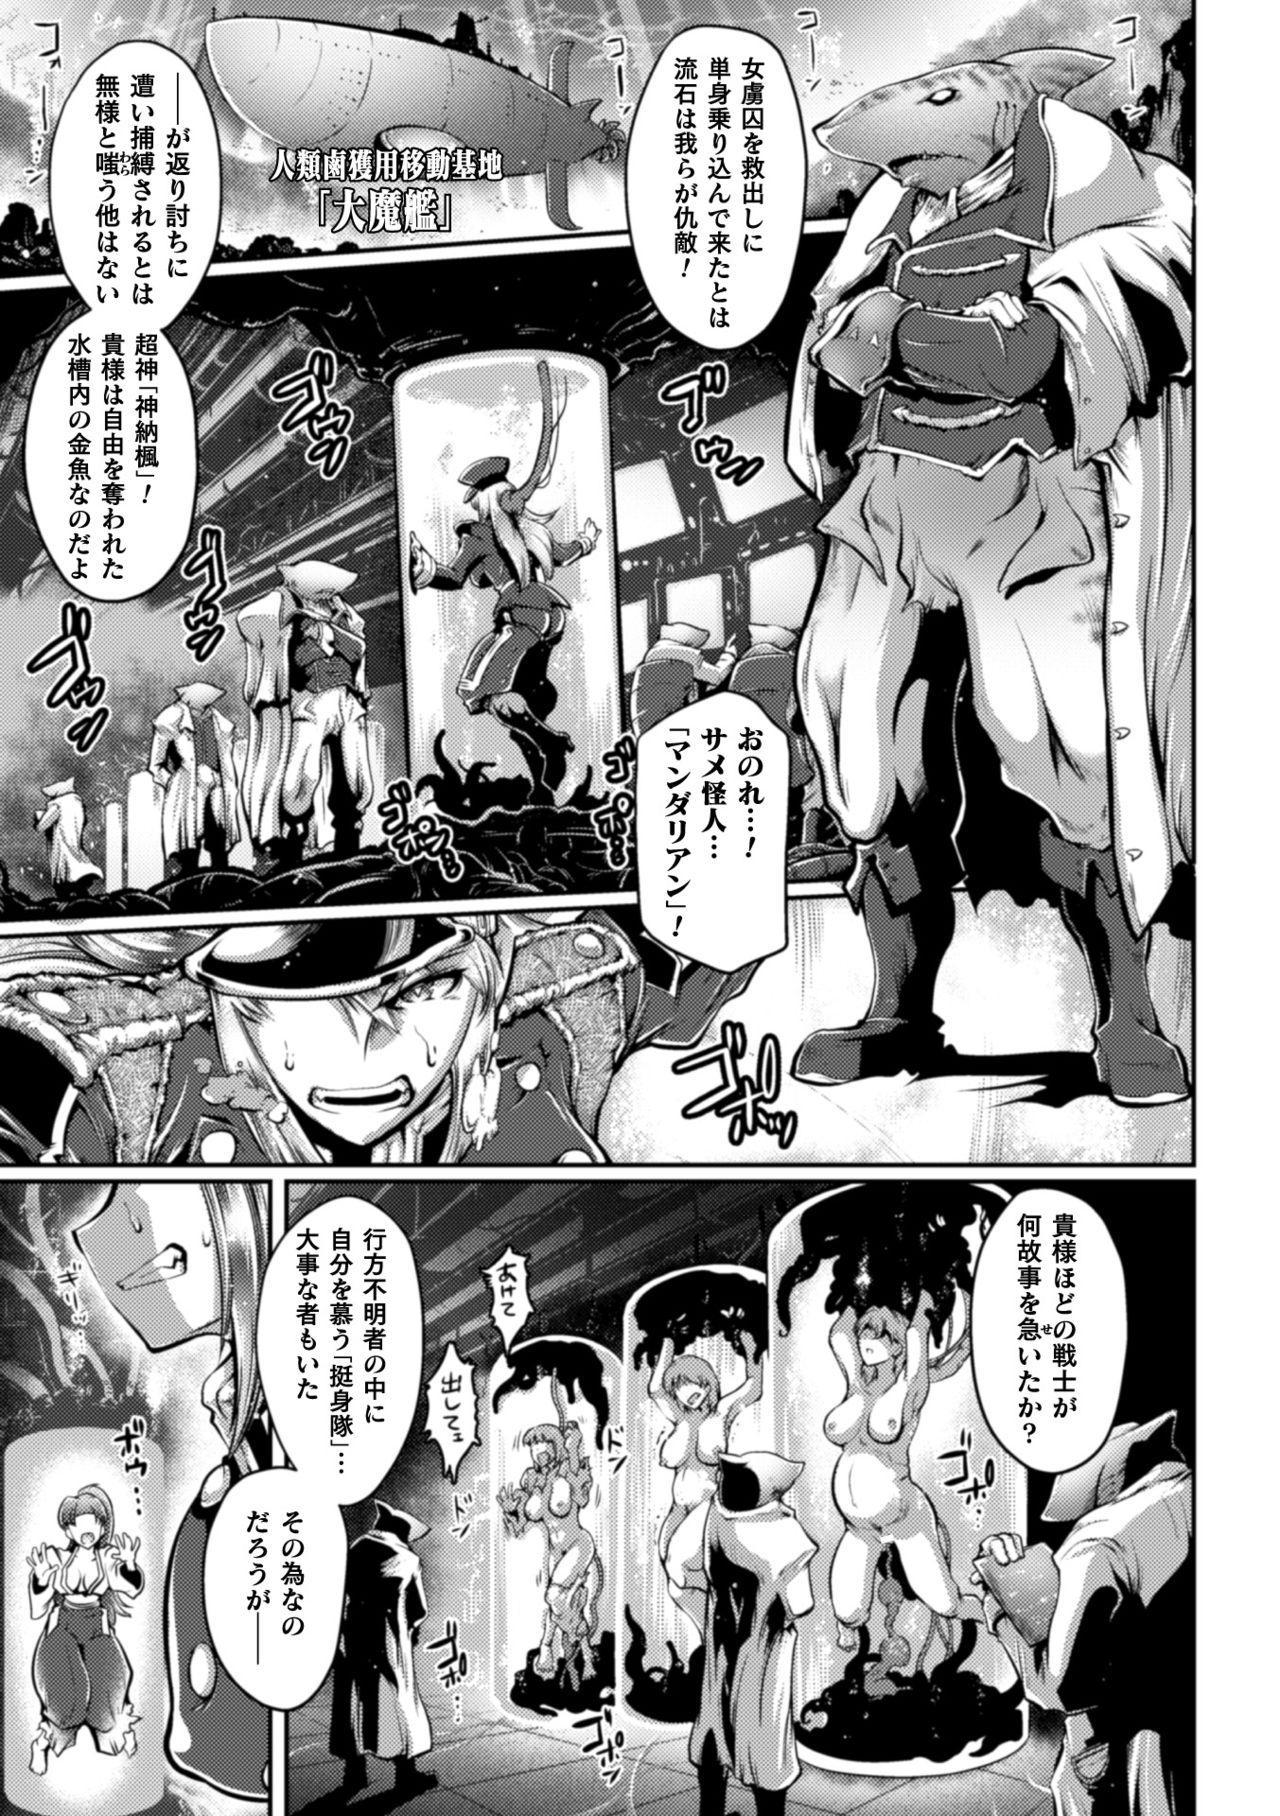 2D Comic Magazine Capsule Kan Seigi no Heroine Mesu Ochi Jikken! Vol. 2 4